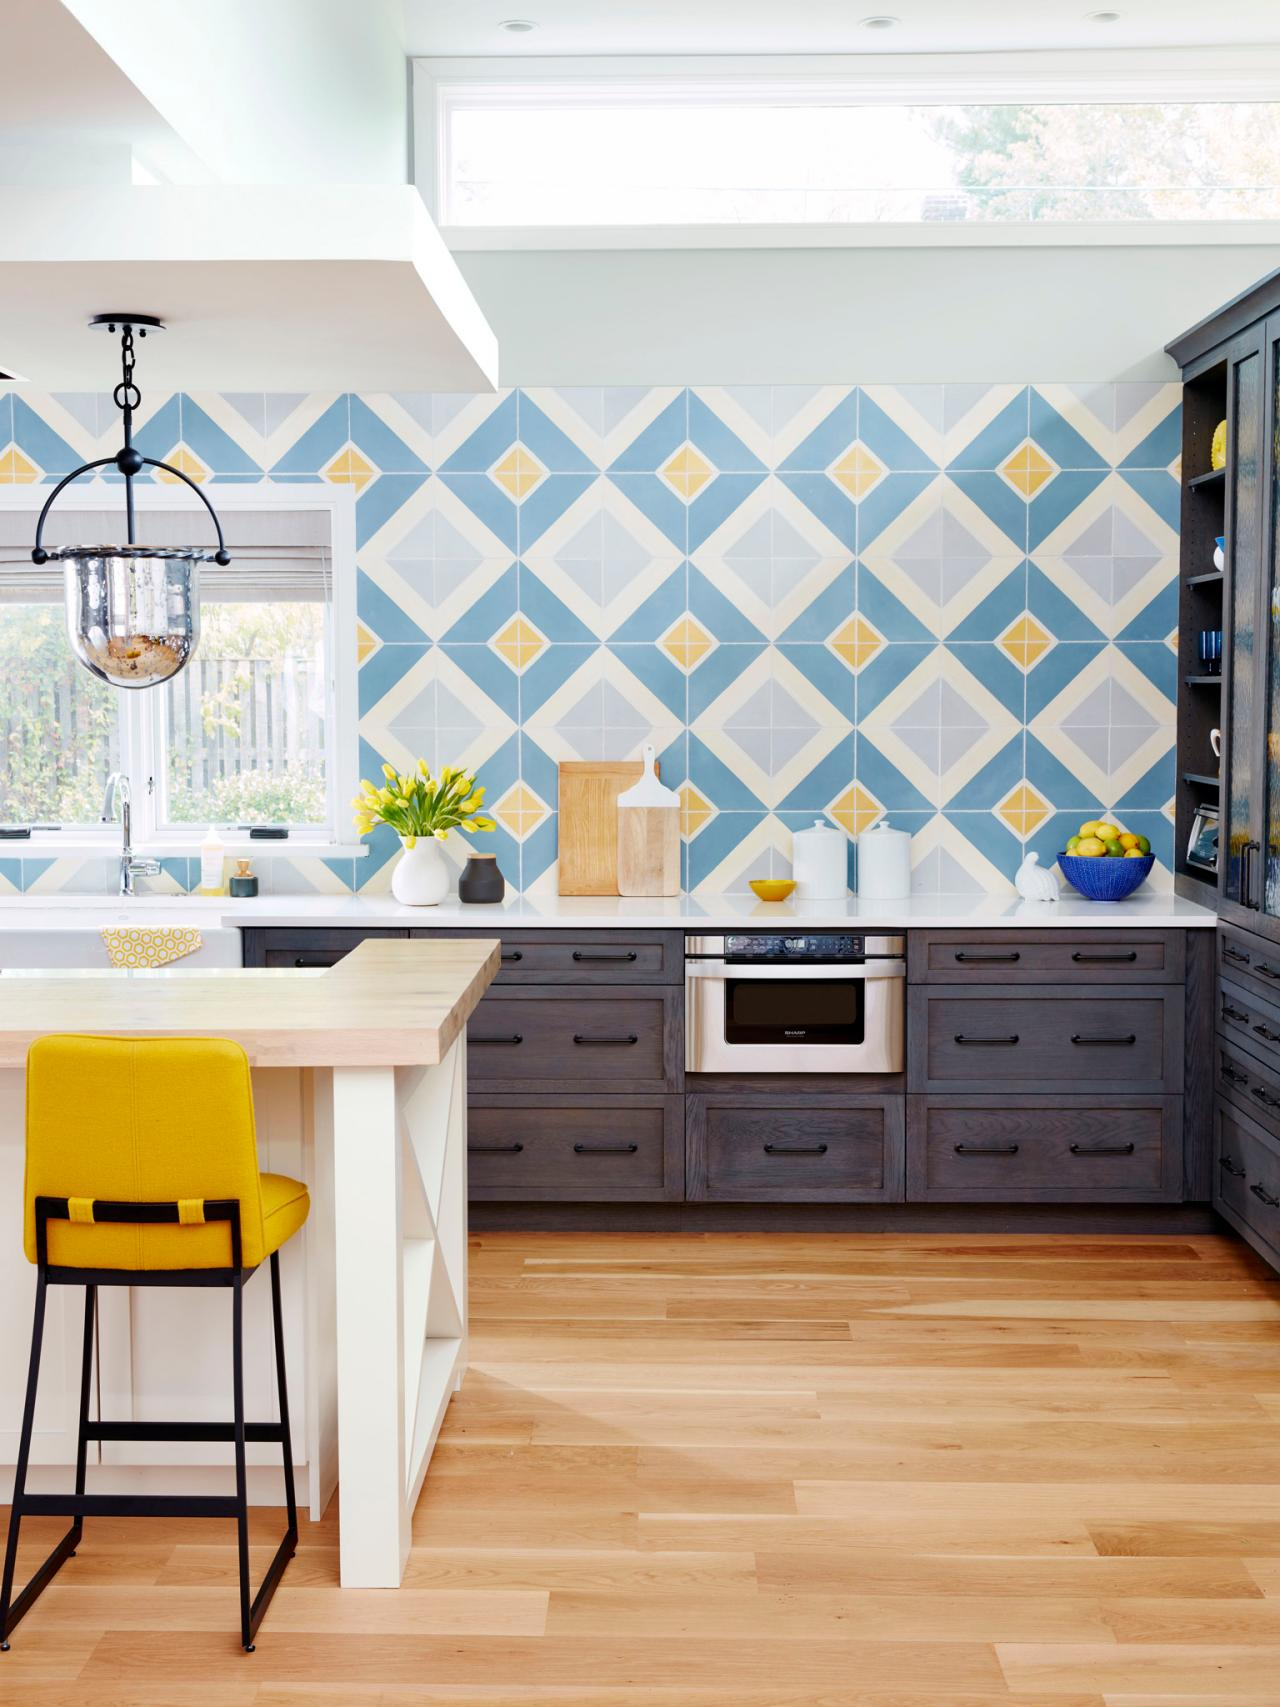 9 Kitchens With Show-Stopping Backsplash | HGTV's Decorating ...